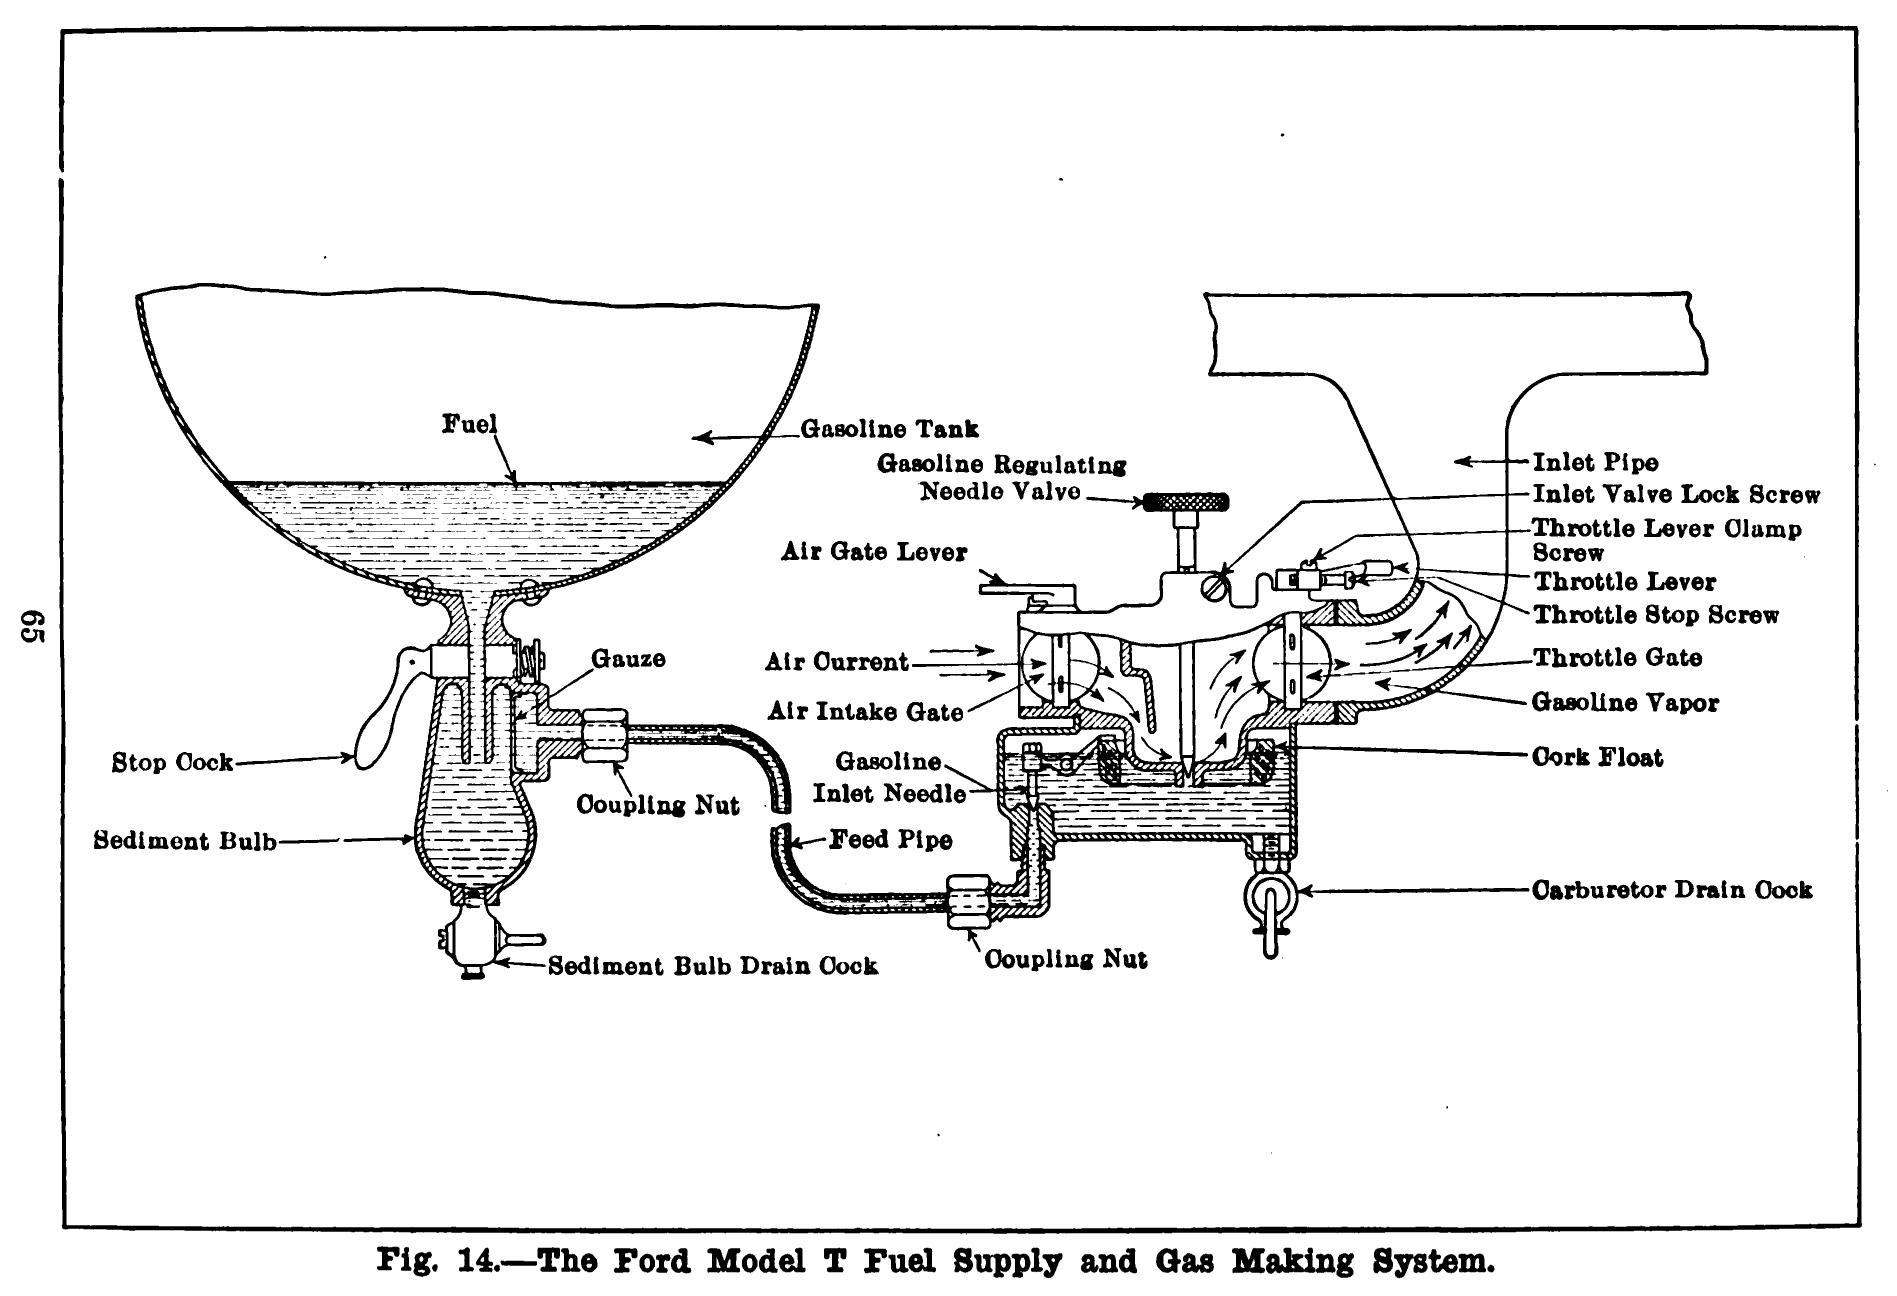 Model T correct wiring diagram | Advertising | Pinterest | Diagram ...